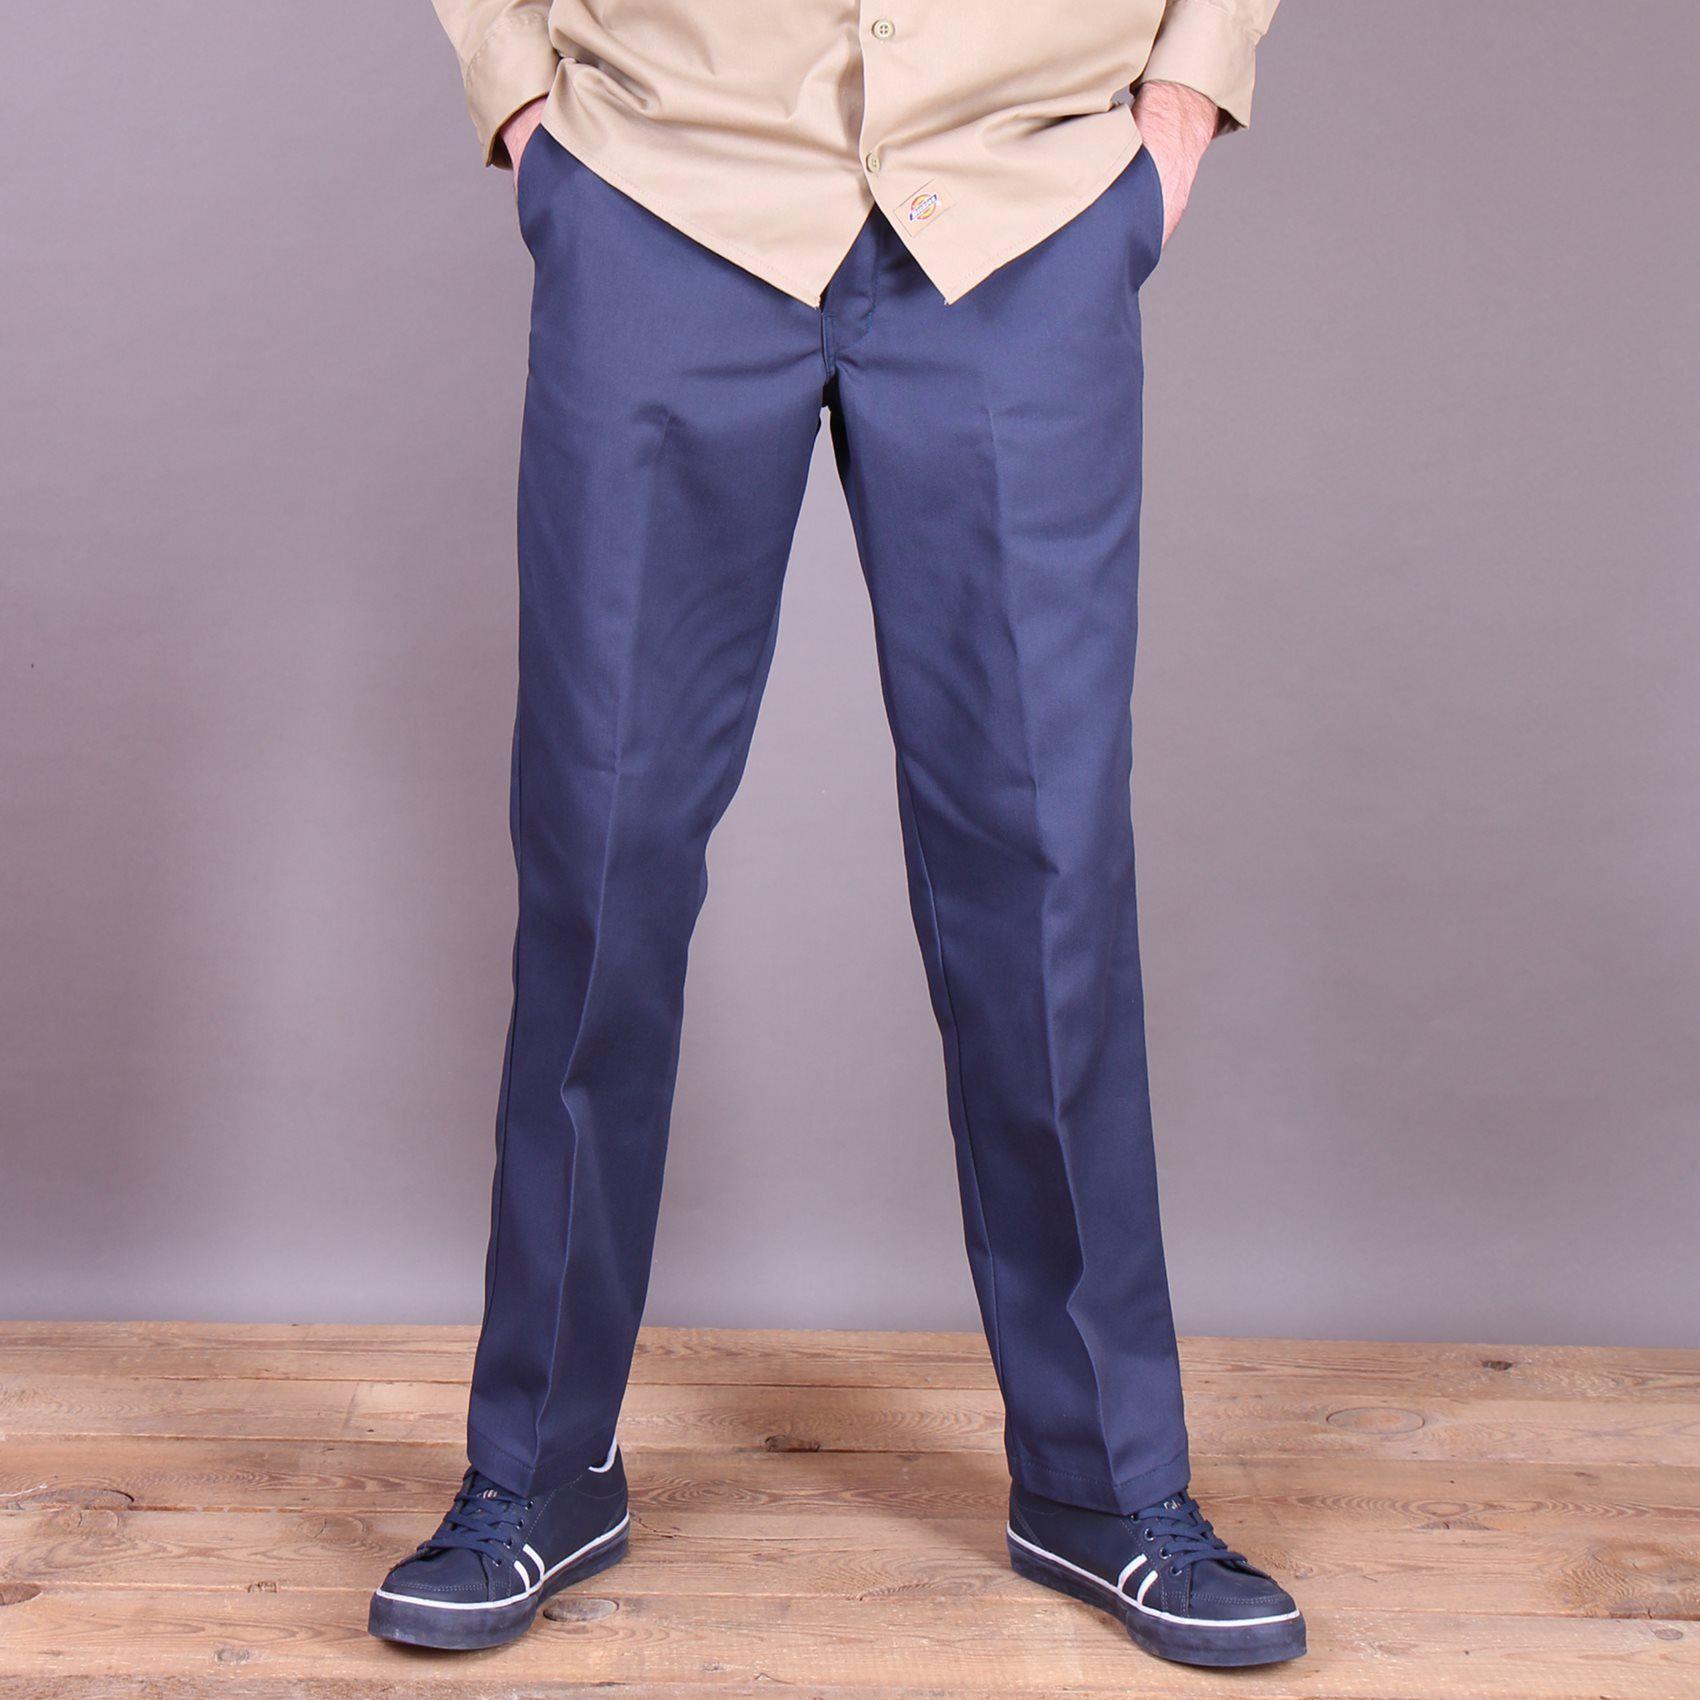 Niebieskie spodnie Chinosy Dickies Original 874 Work Pant Navy Blue   wwwbrandsplanetpl